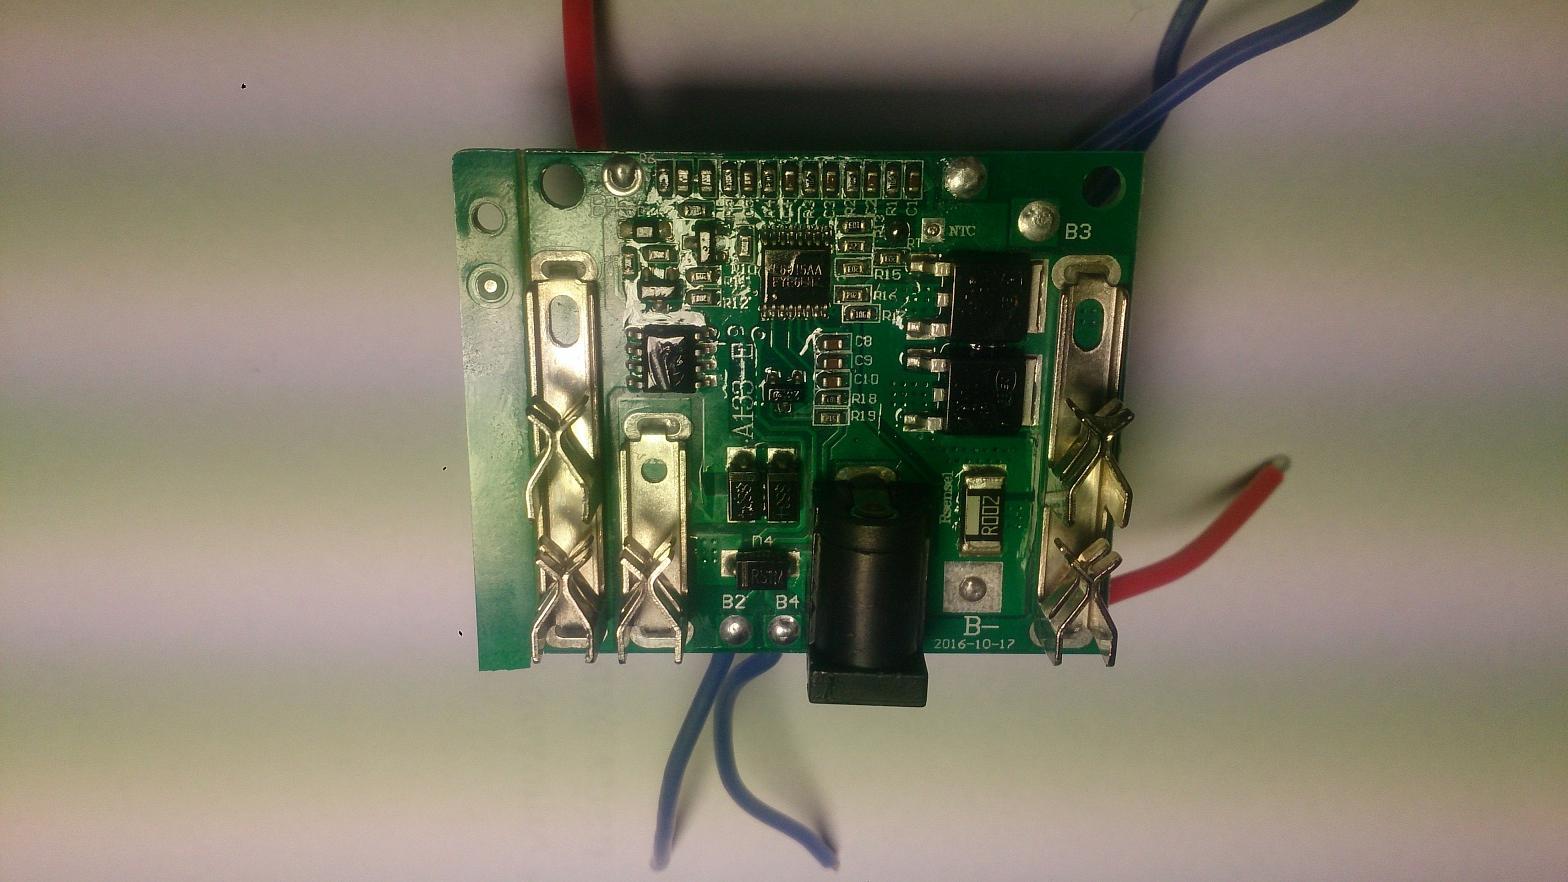 Rebuild Li Ion Cordless Screwdriver Battery Pcm Pcb Liion Protection Circuit Module Diy 18650 Cell Ebay 2017 01 31 101341